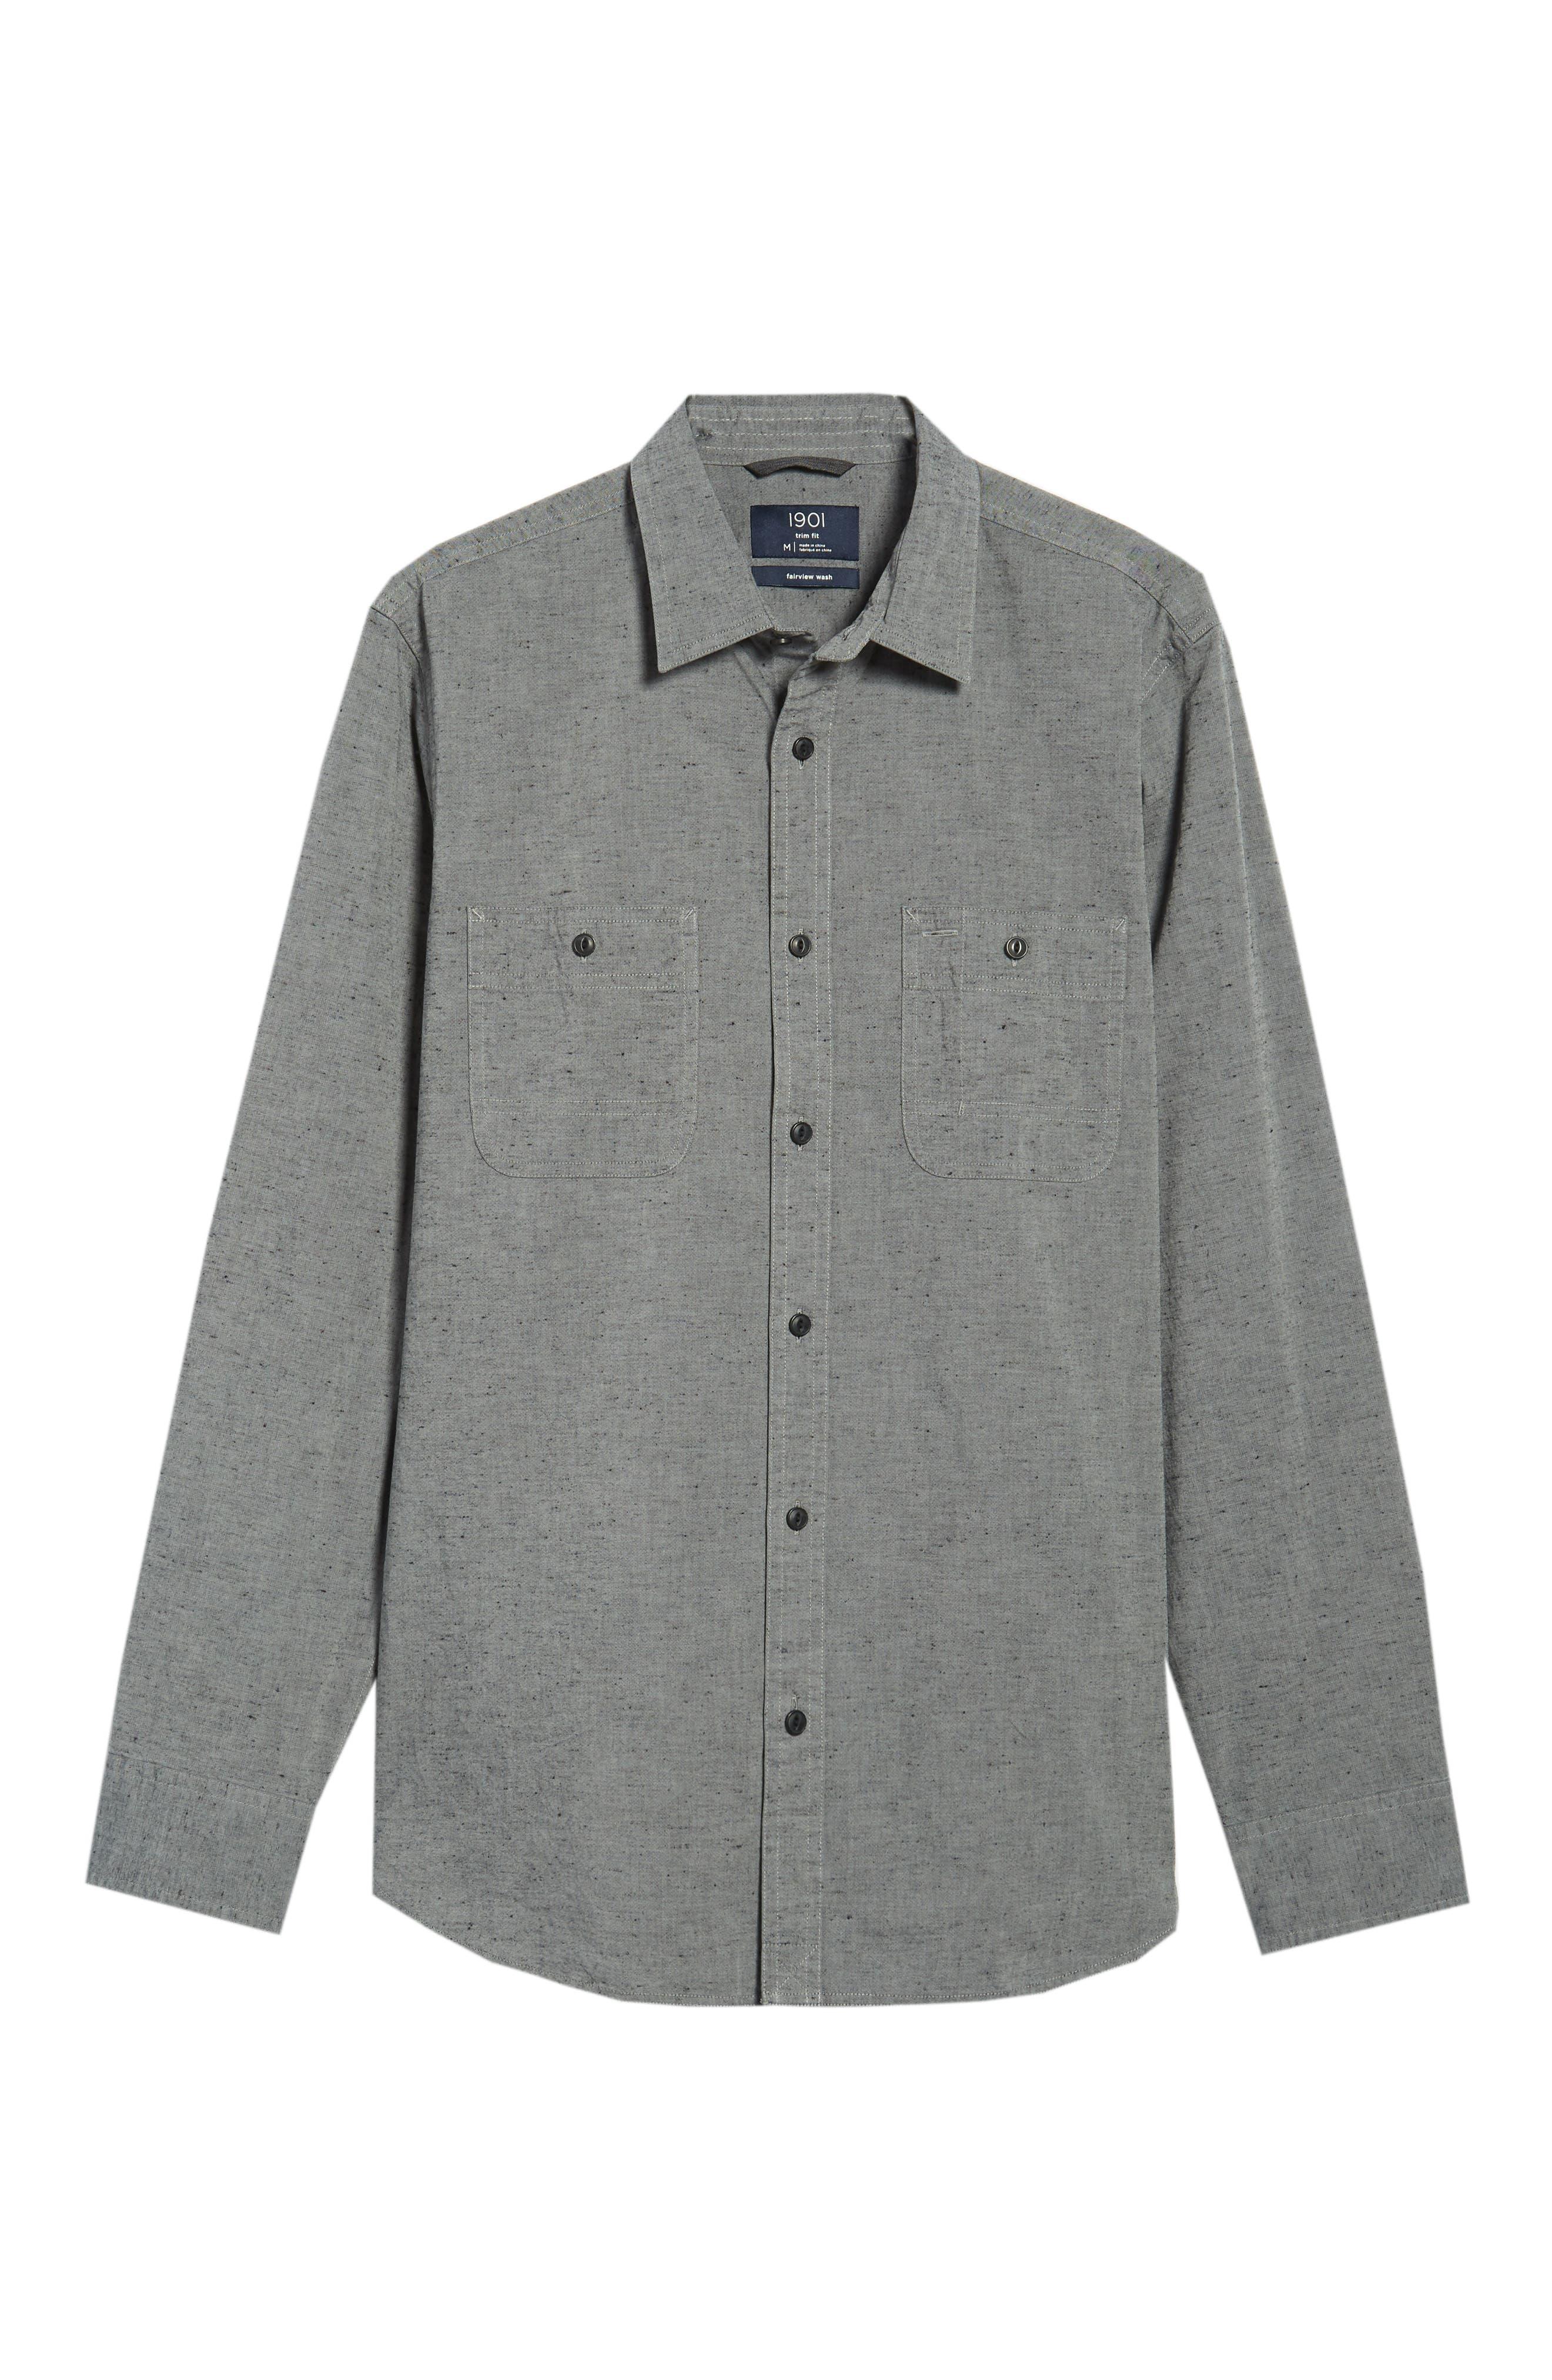 Workwear Chambray Sport Shirt,                             Alternate thumbnail 6, color,                             GREY ONYX NEP CHAMBRAY